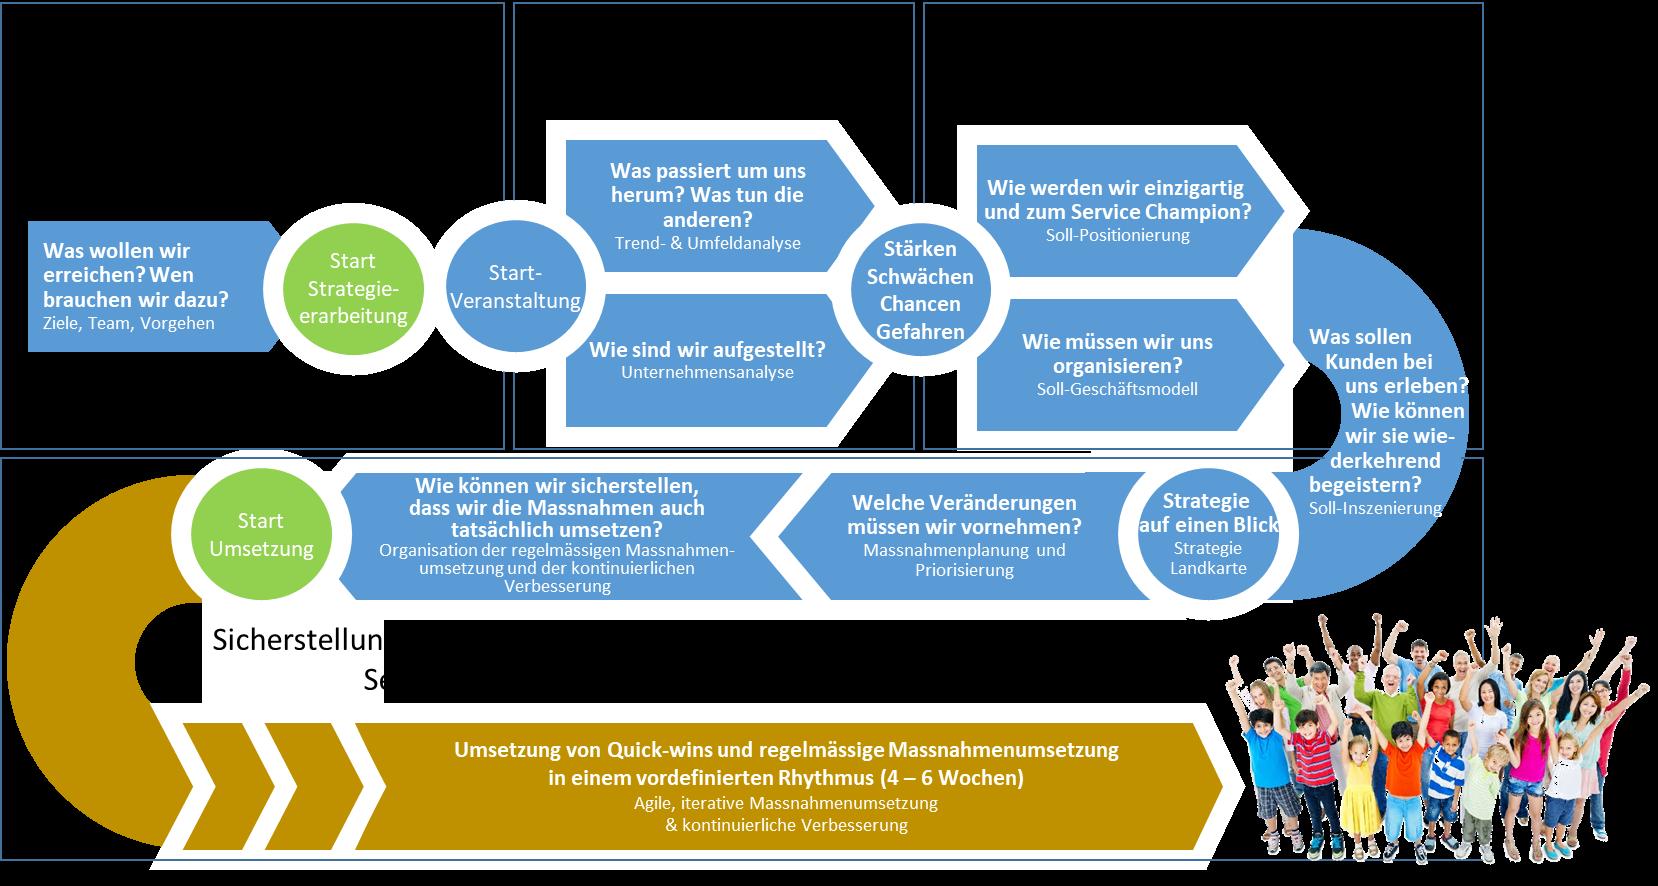 The-Black-Elephant-Strategieprozess-zu-Kundenbegeisterung